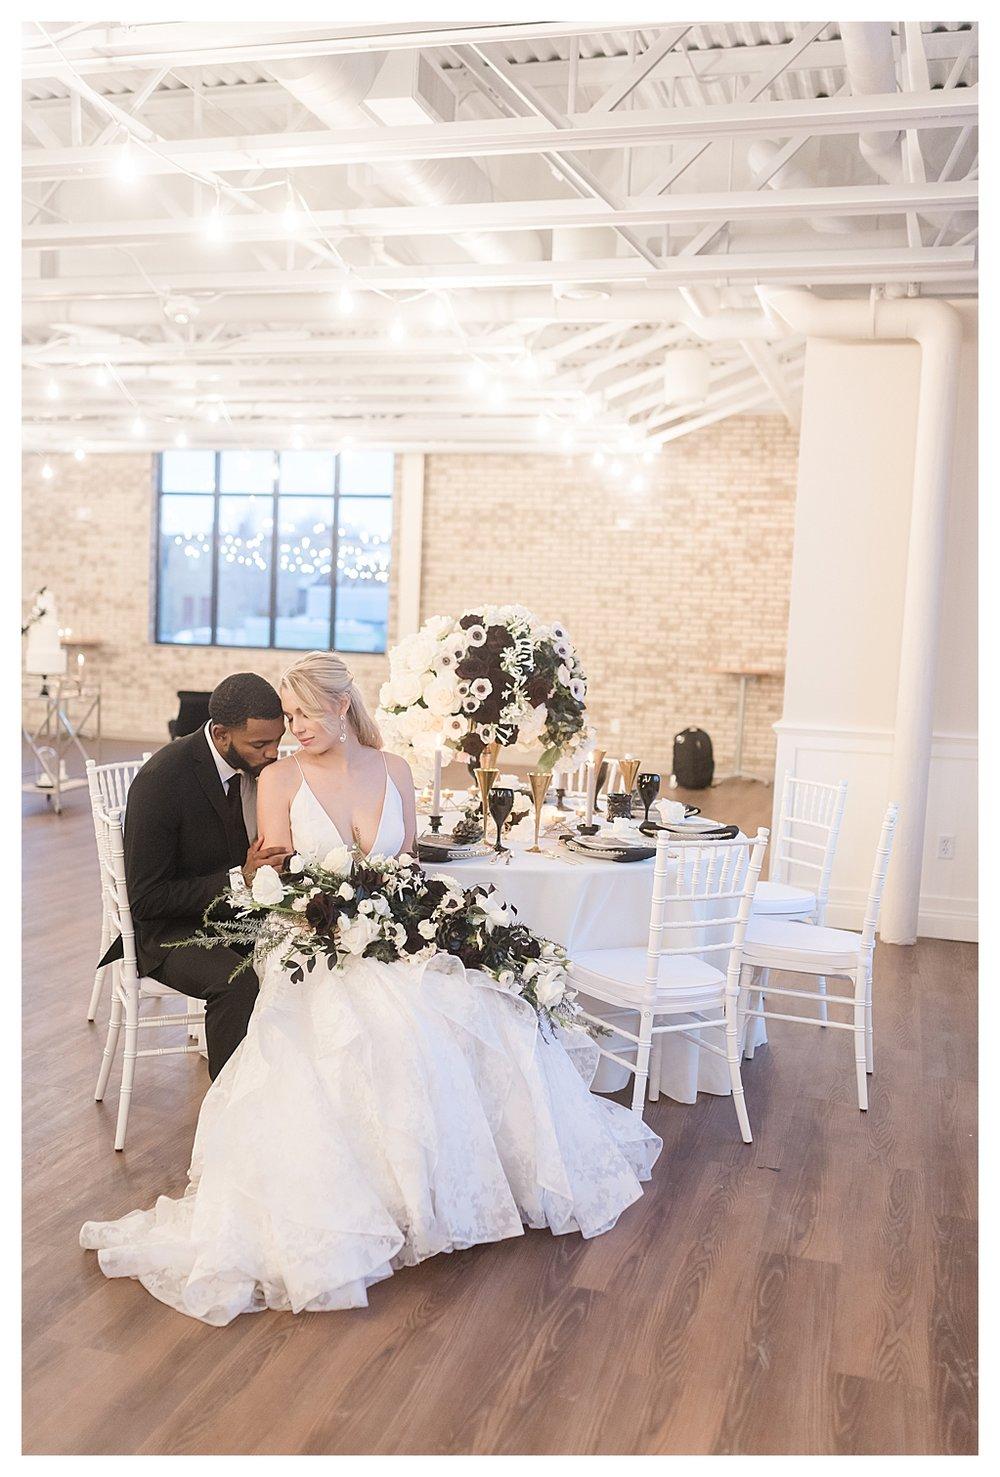 Elegant Black and White Winter Rooftop Wedding_0795.jpg